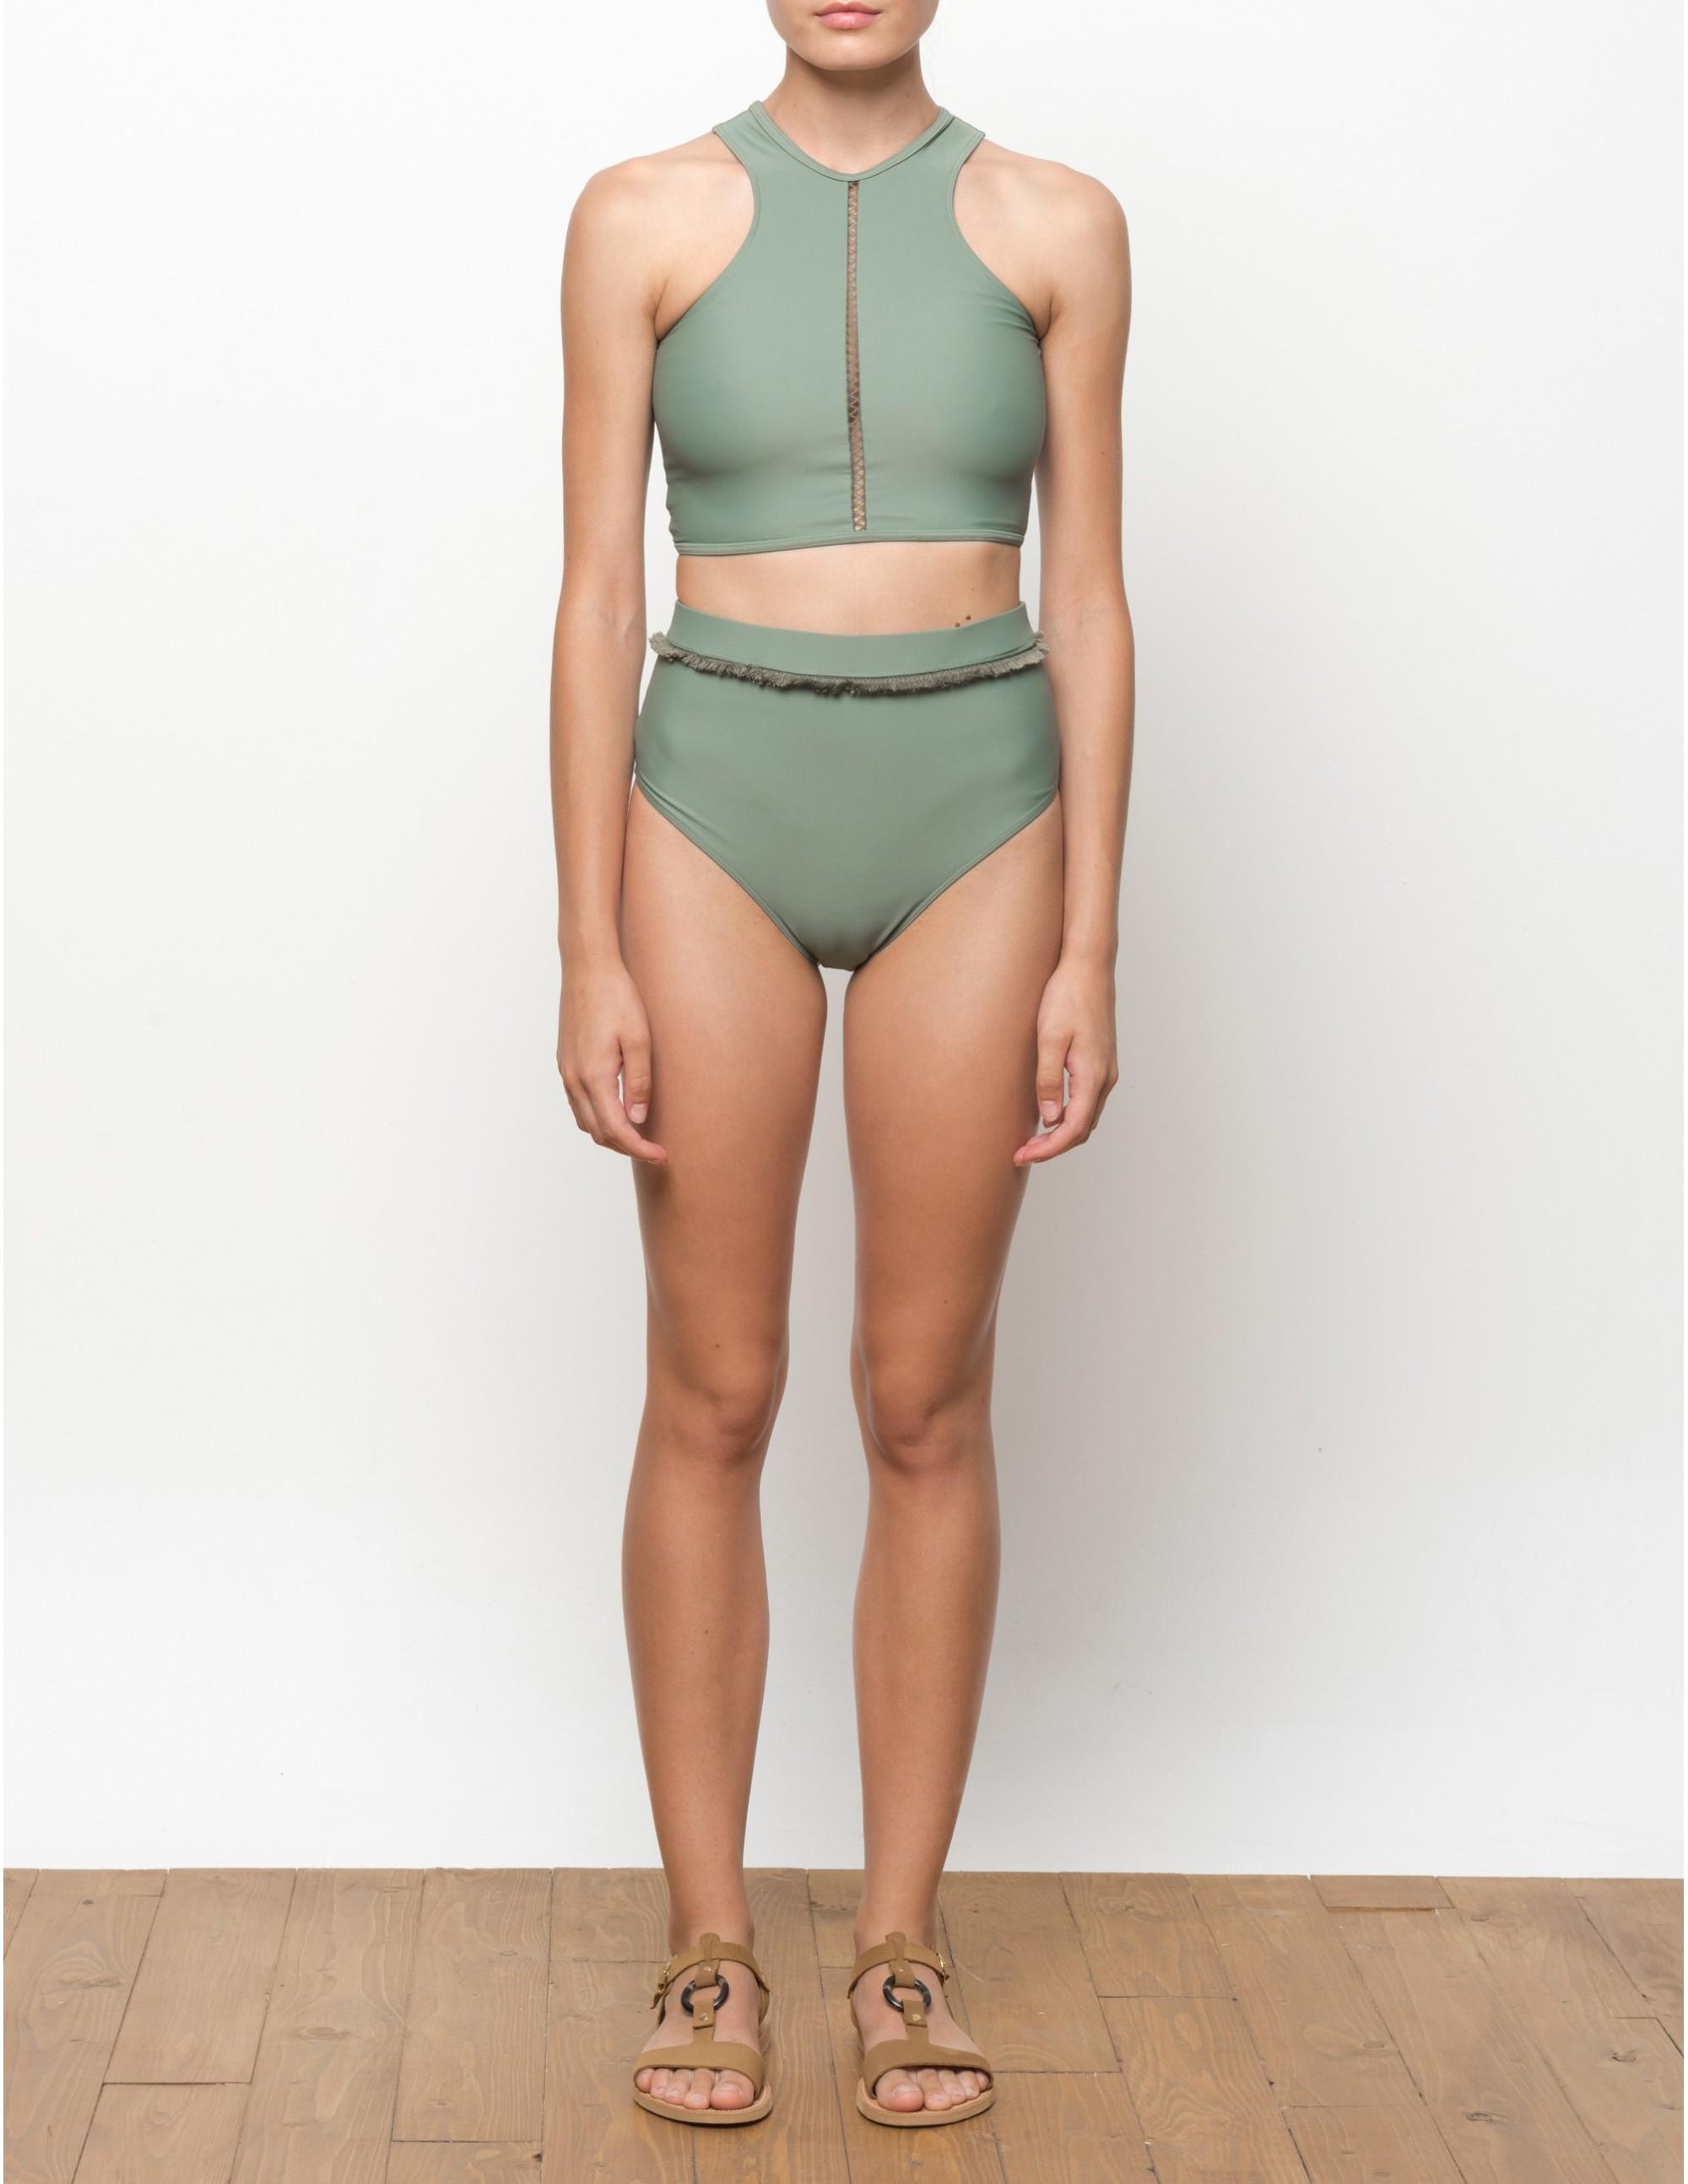 NAKU bikini bottom - SERENGETI